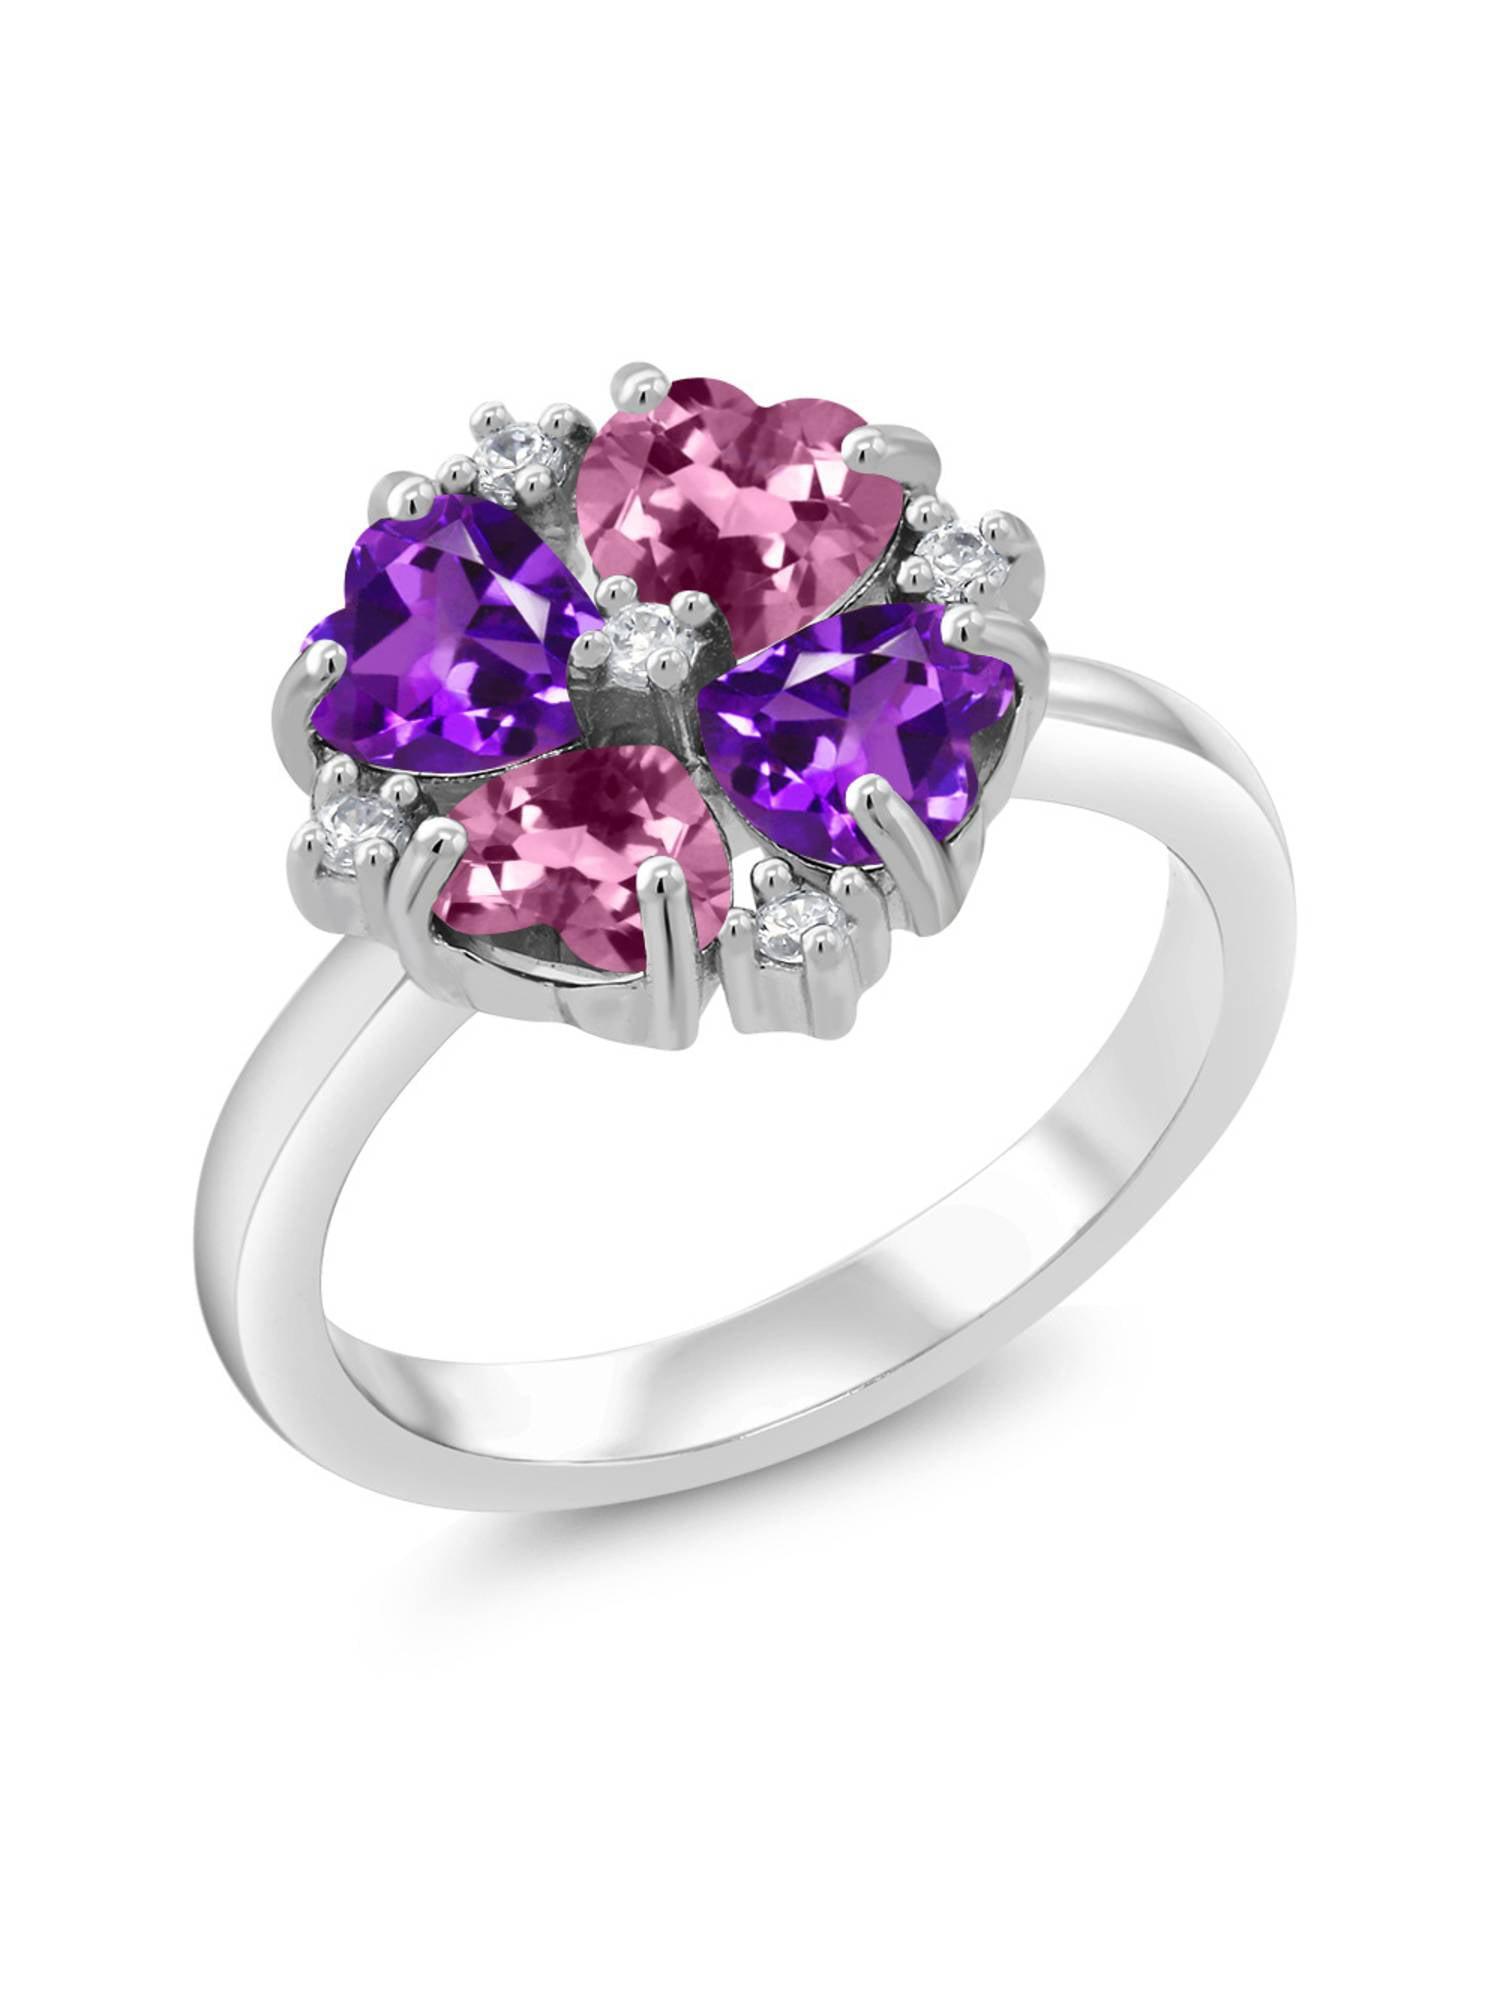 1.76 Ct Heart Shape Pink Tourmaline Purple Amethyst 925 Sterling Silver Ring by